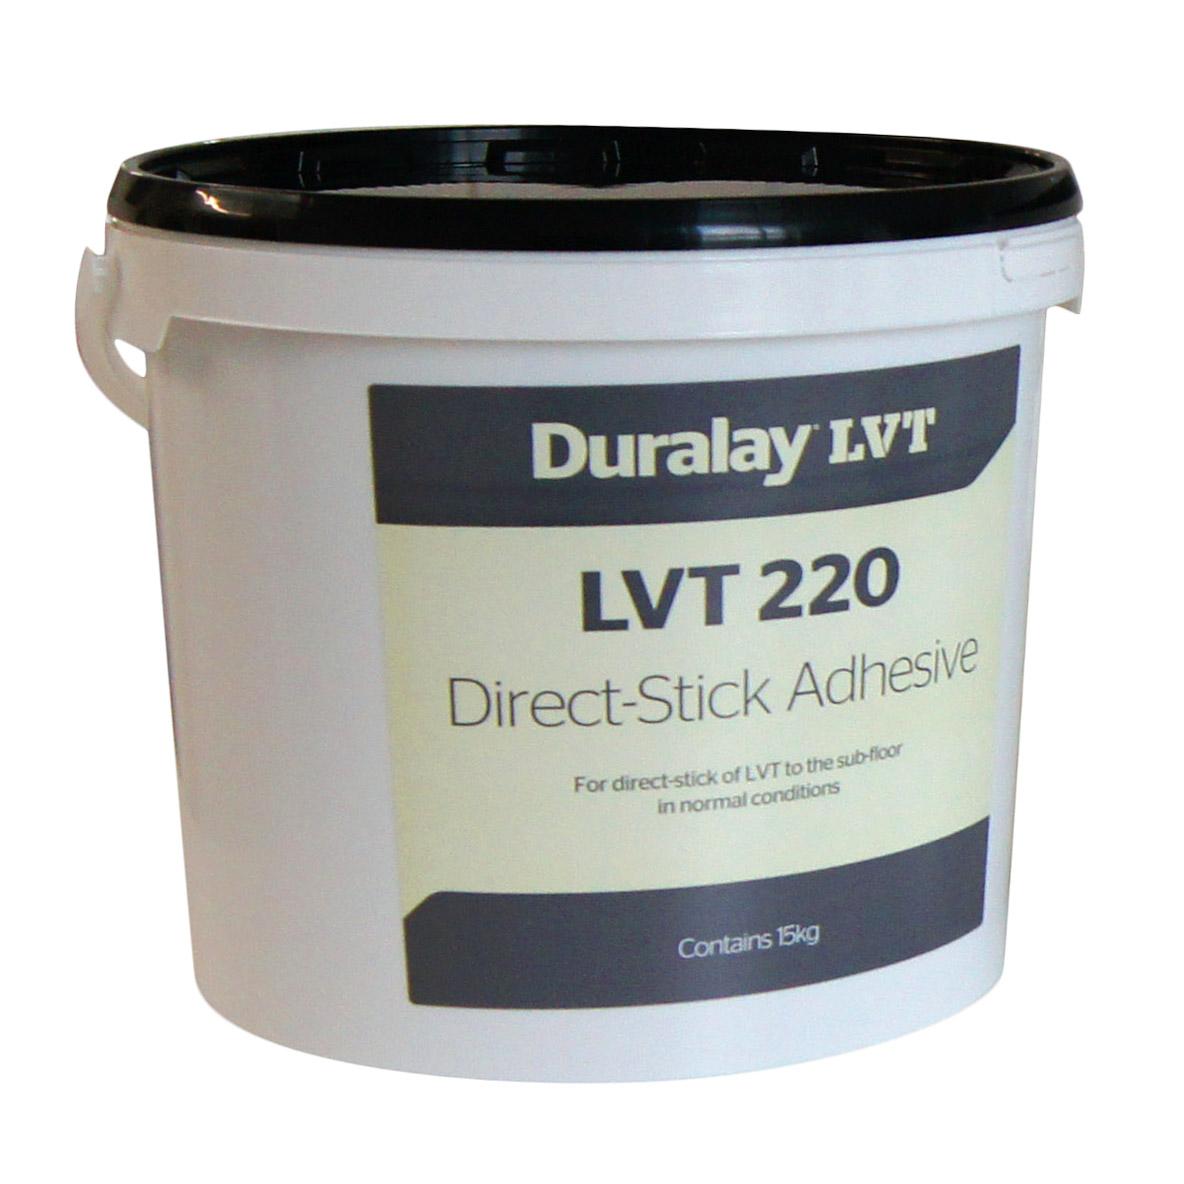 LVT220 Direct-Stick Adhesive | Interfloor